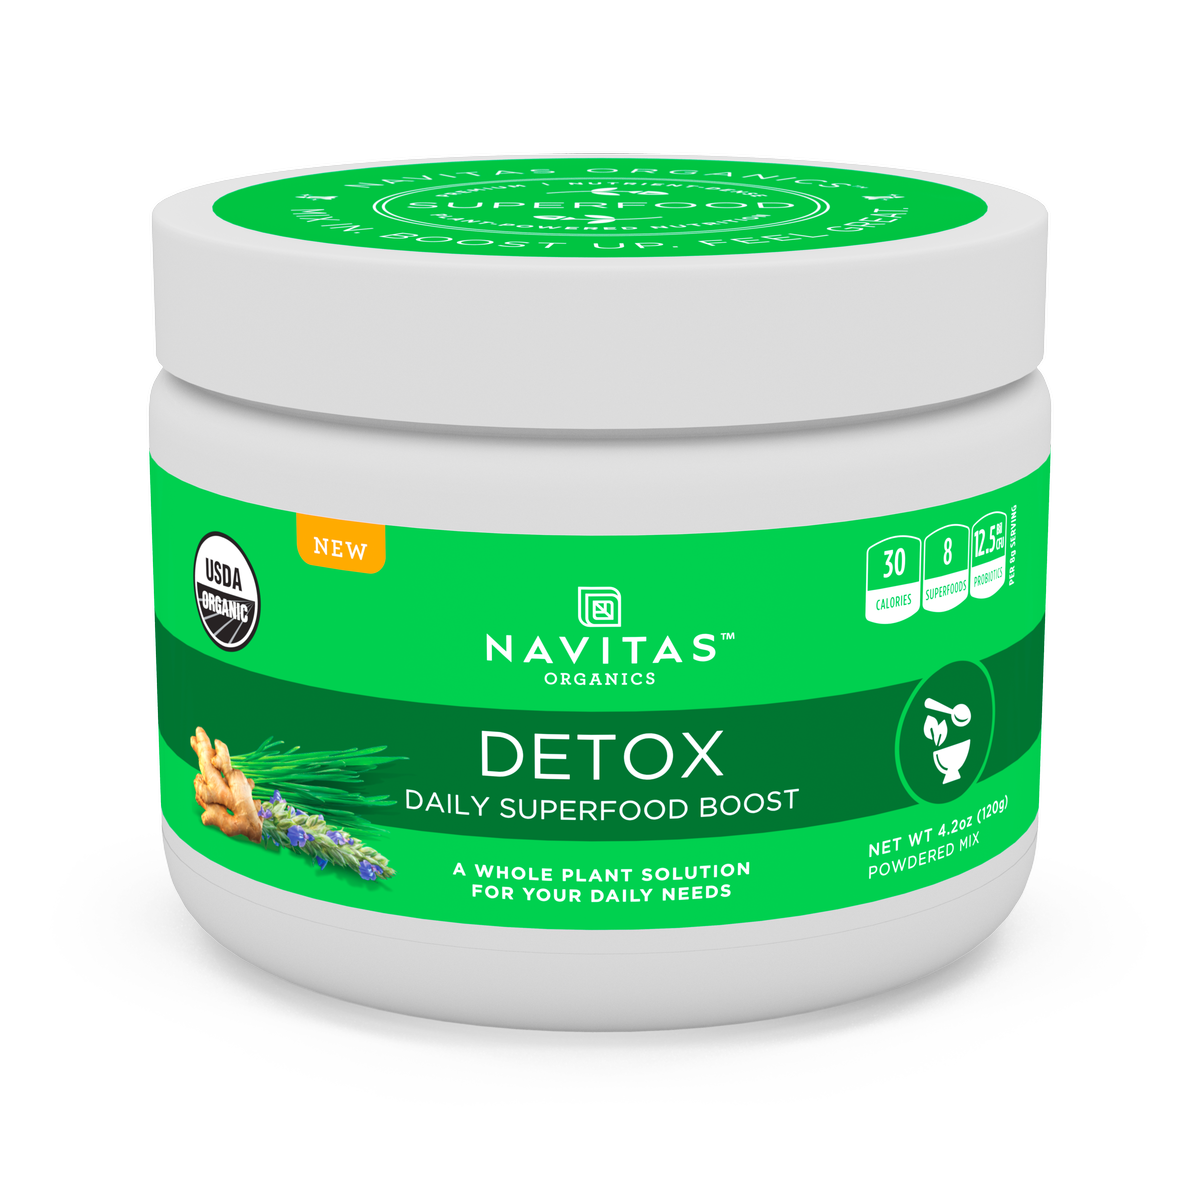 Navitas Organics Daily Detox Superfood Powder, 4.2 Oz, 15 Servings